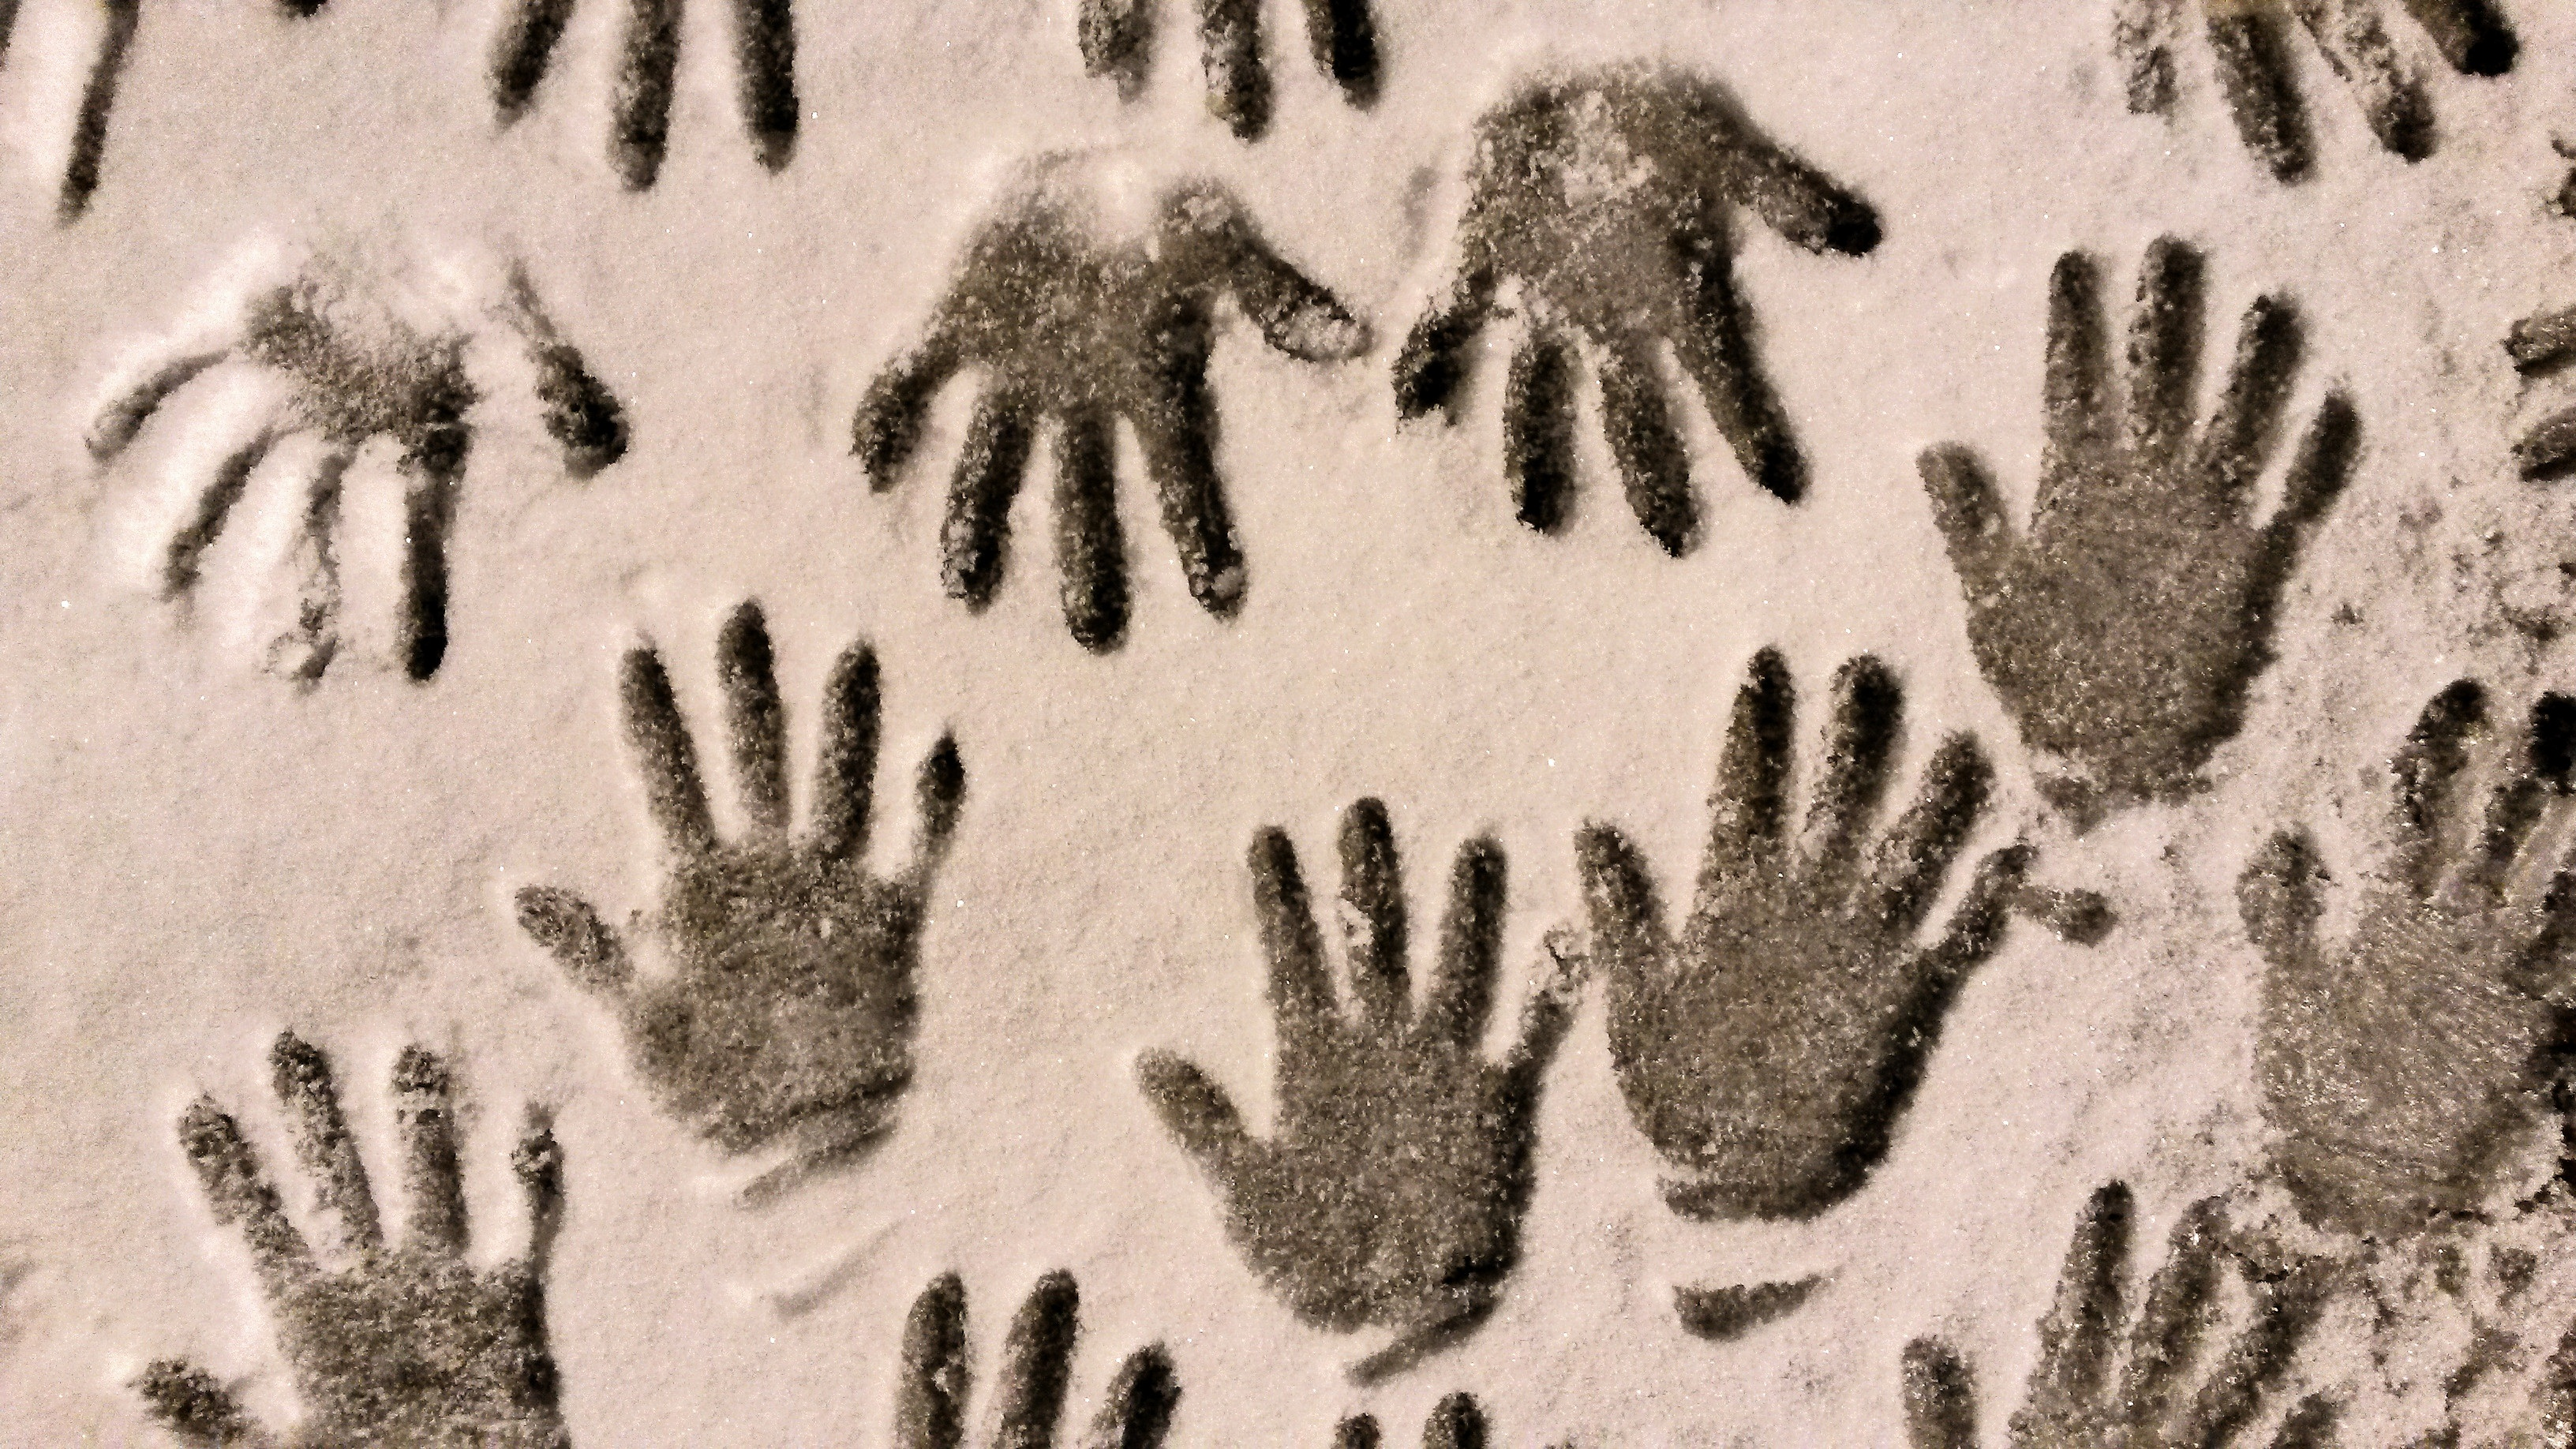 children_s_handprints